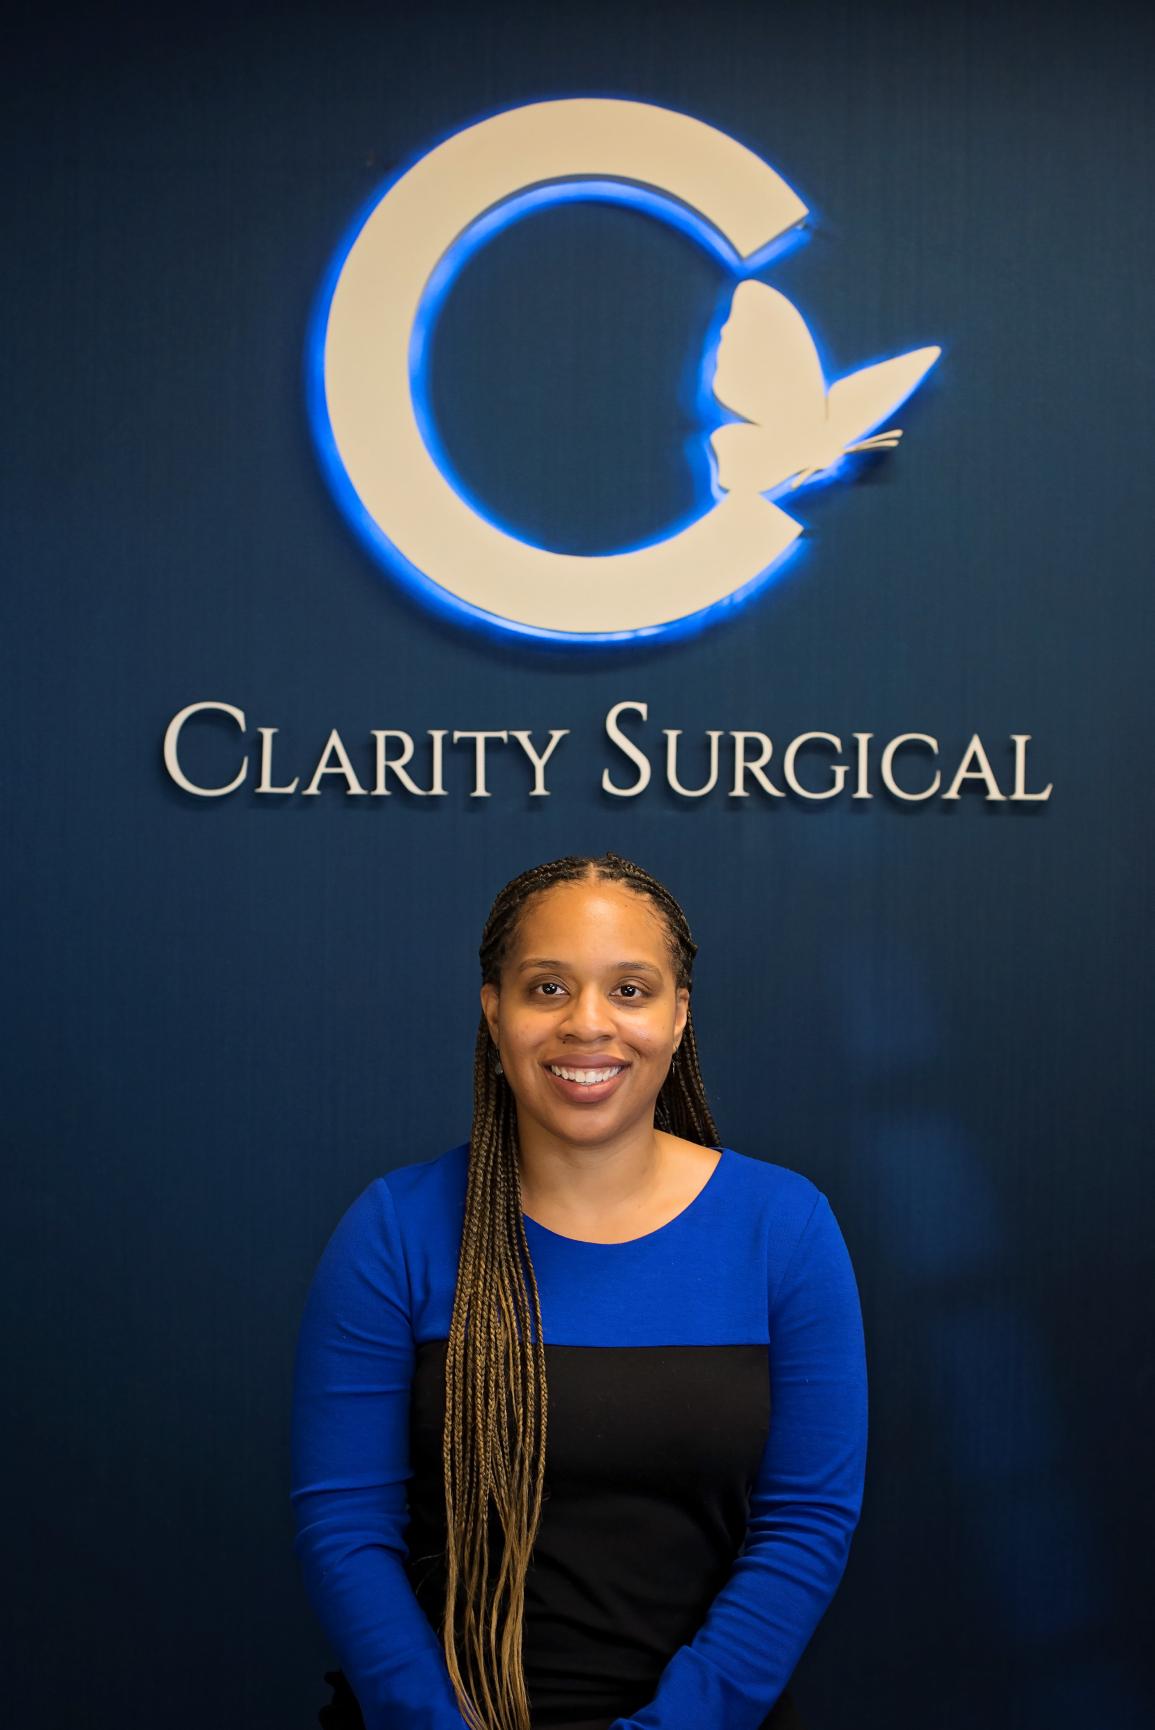 Allison Reeder - Surgical Coordinator